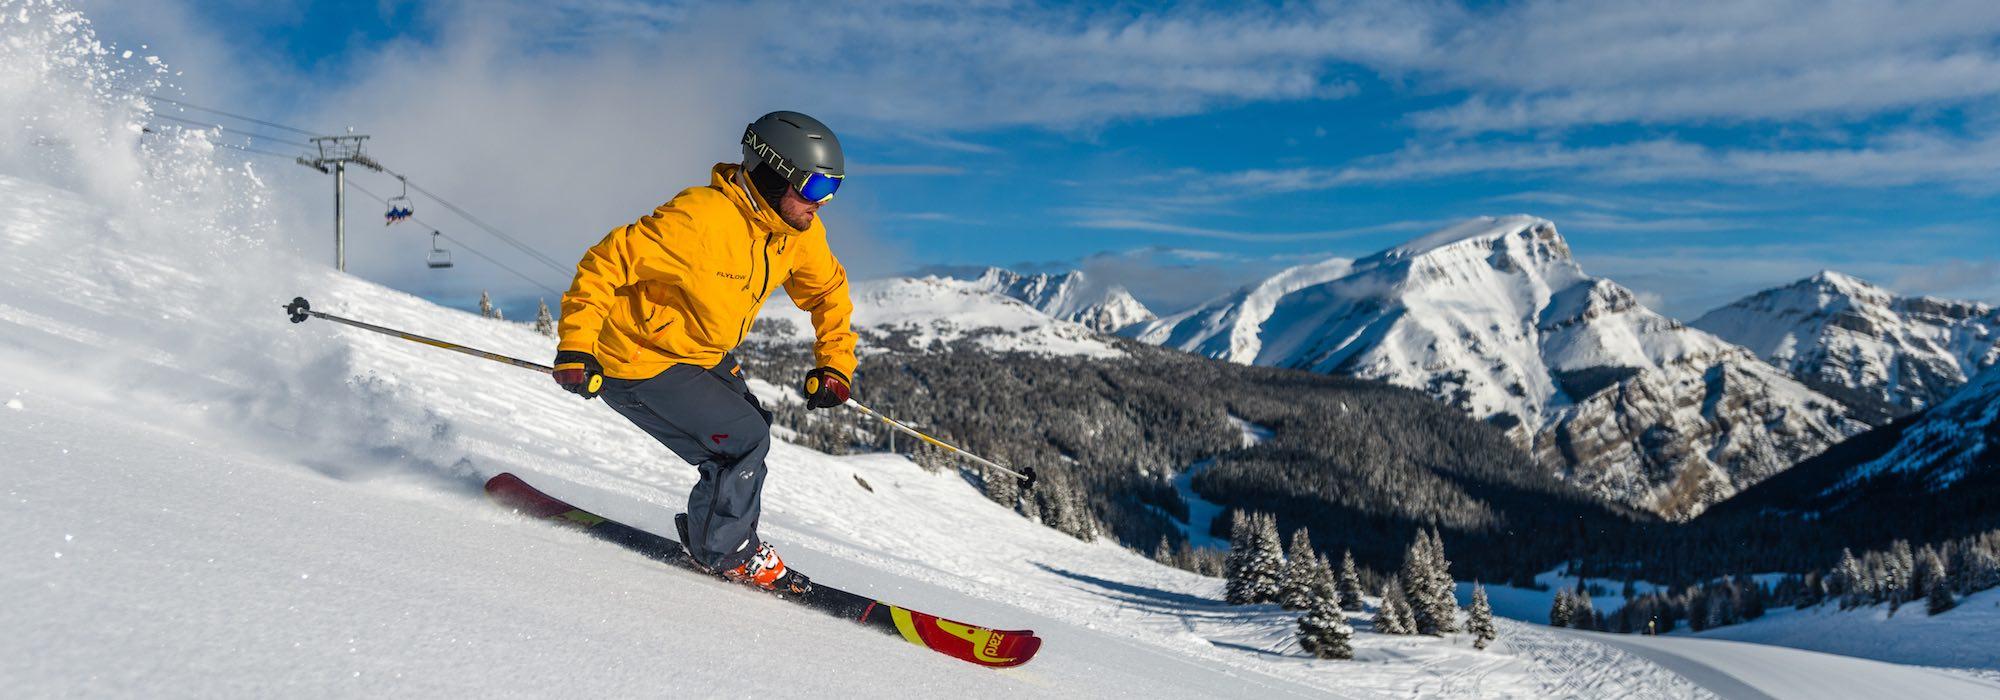 Skier at Sunshine Village in Banff National Park.